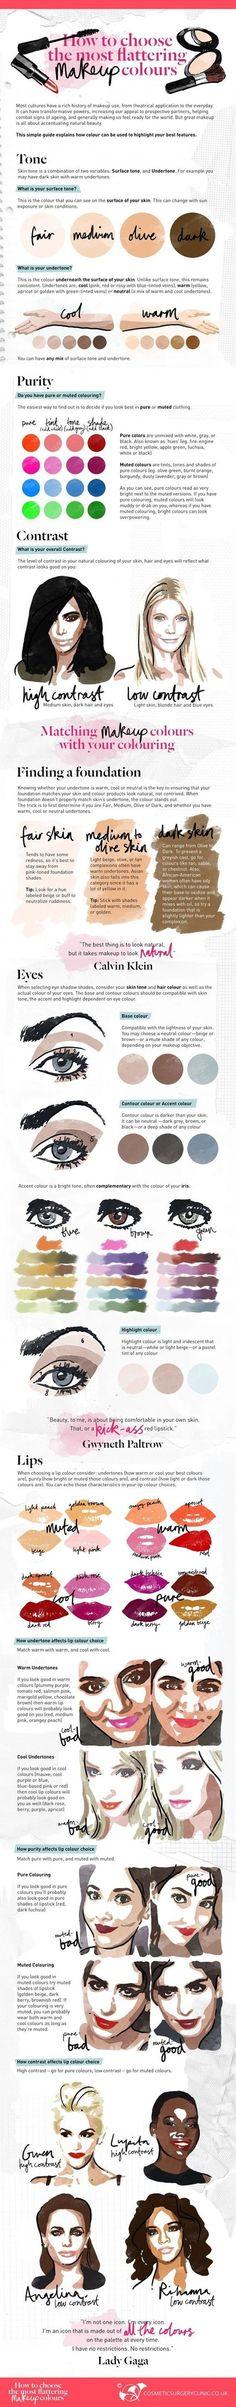 Flattering Makeup Colors By Skin Tone